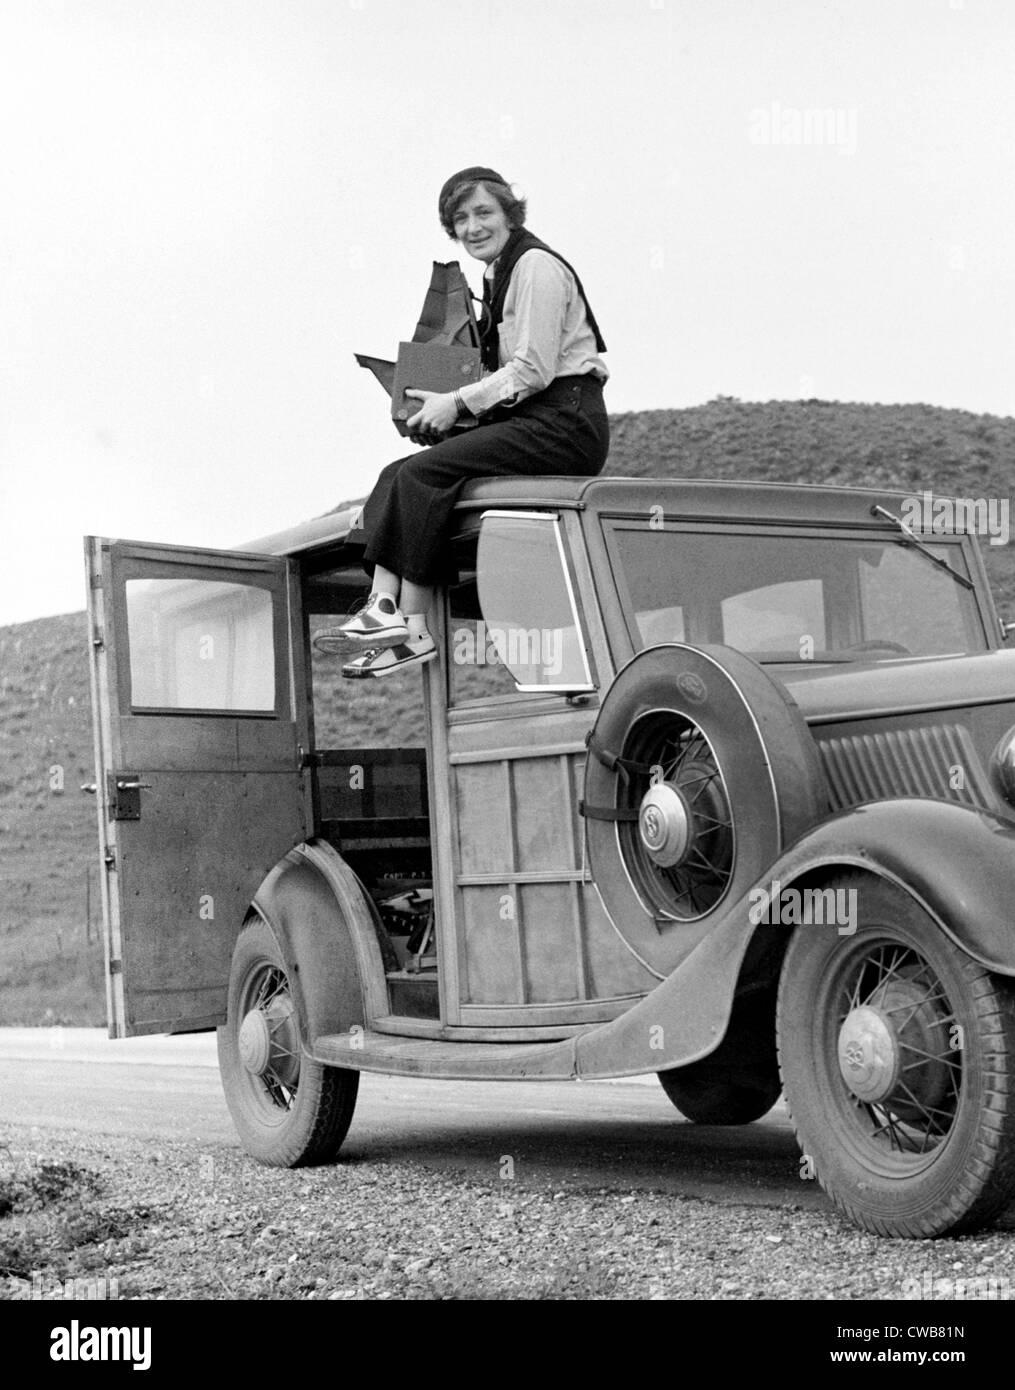 Dorothea Lange, Resettlement Administration photographer, California, February, 1936. - Stock Image